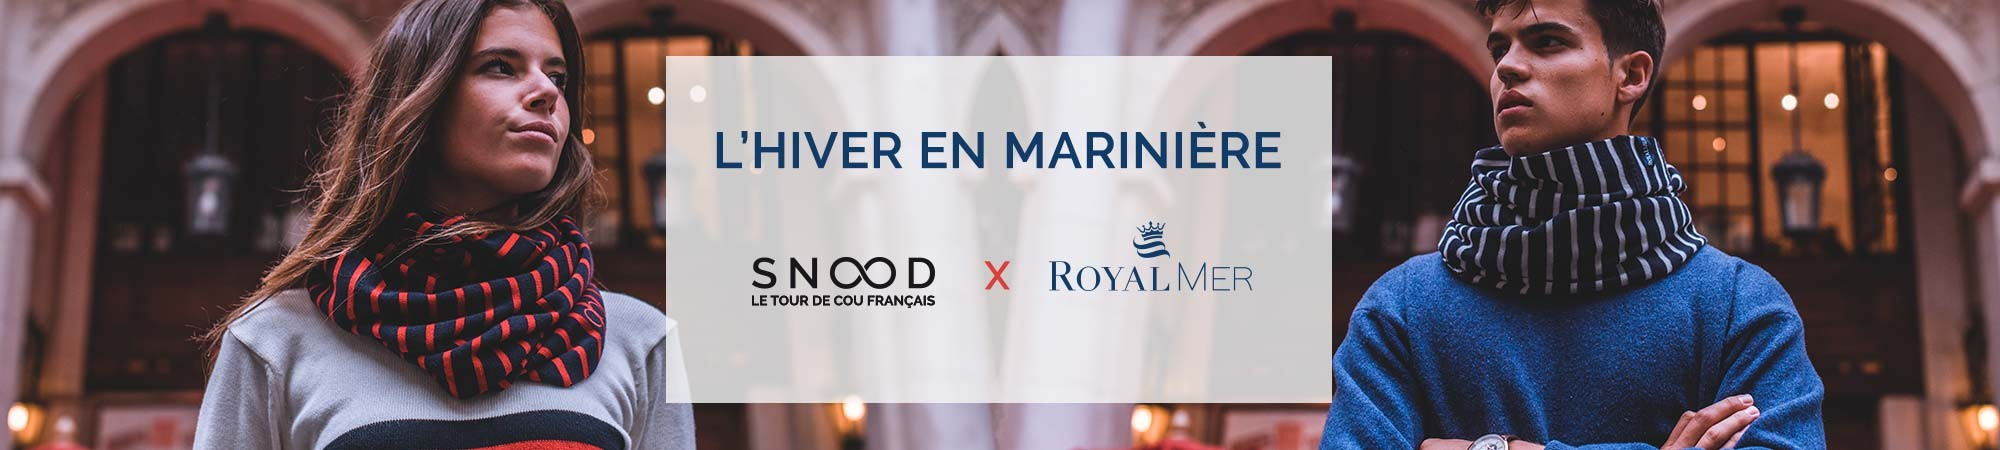 Tous en marinière - Collab Snood x Royal Mer